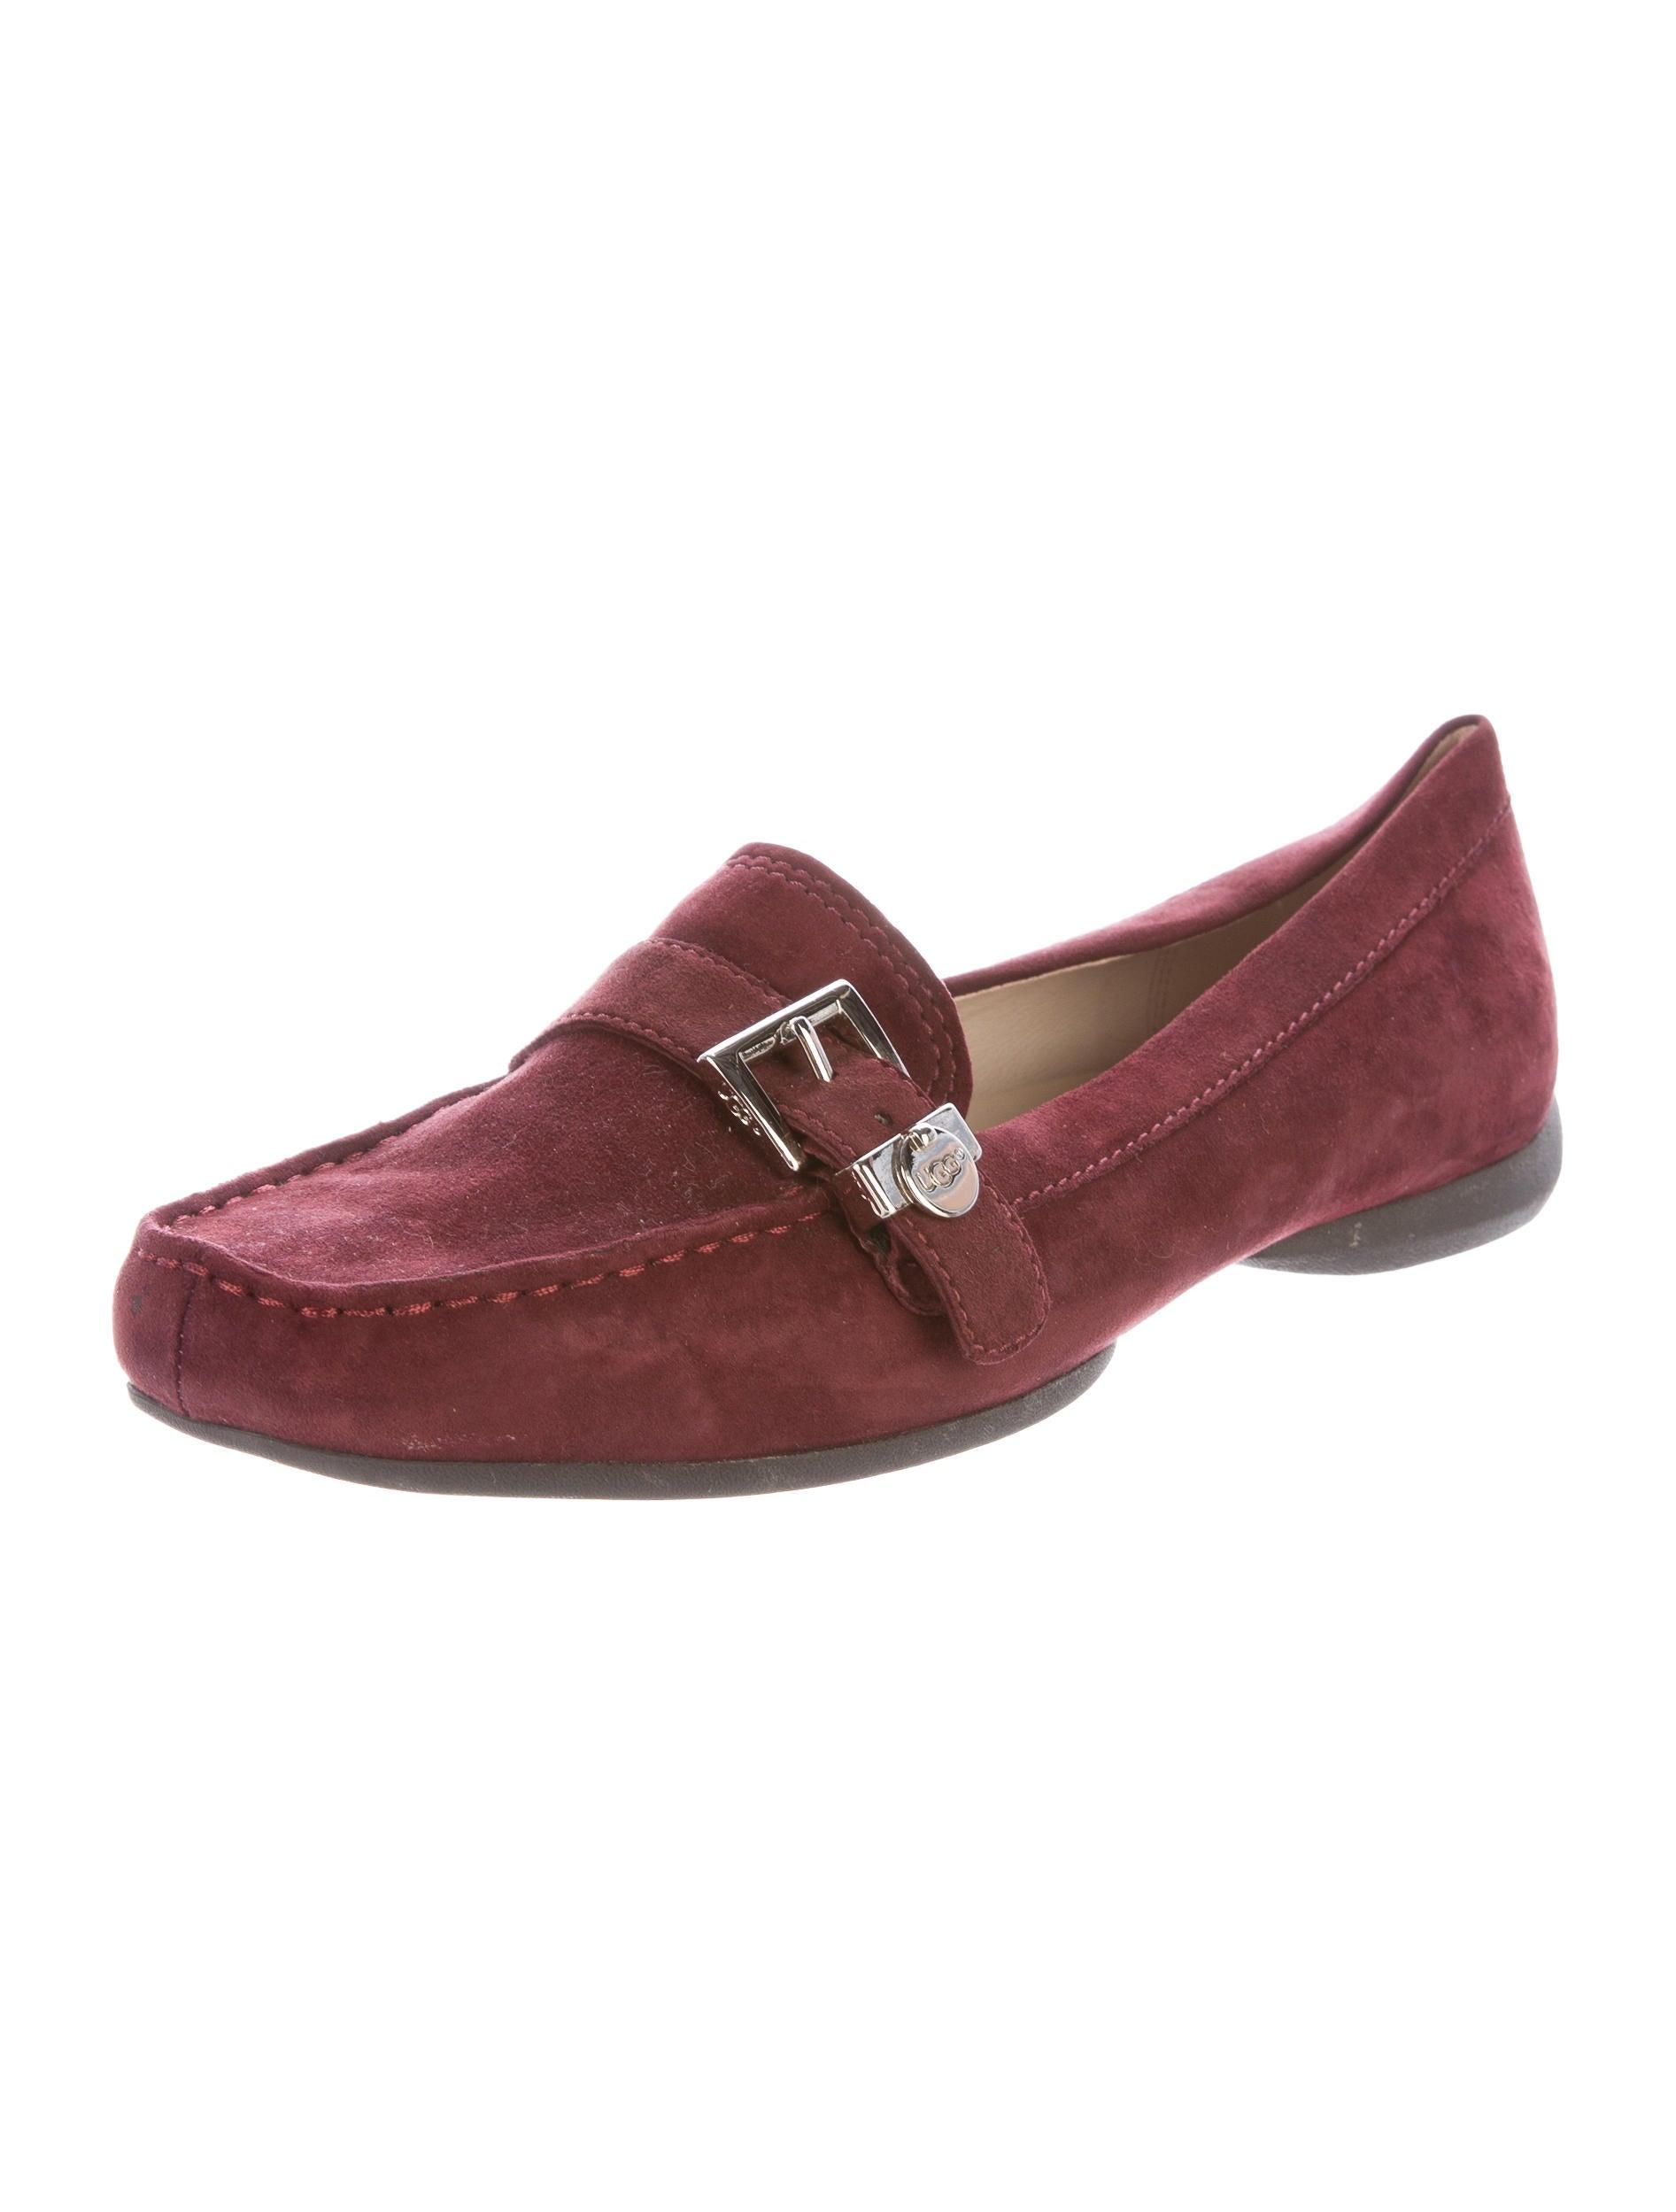 1b5ecd74b23 Womens Ugg Suede Loafers